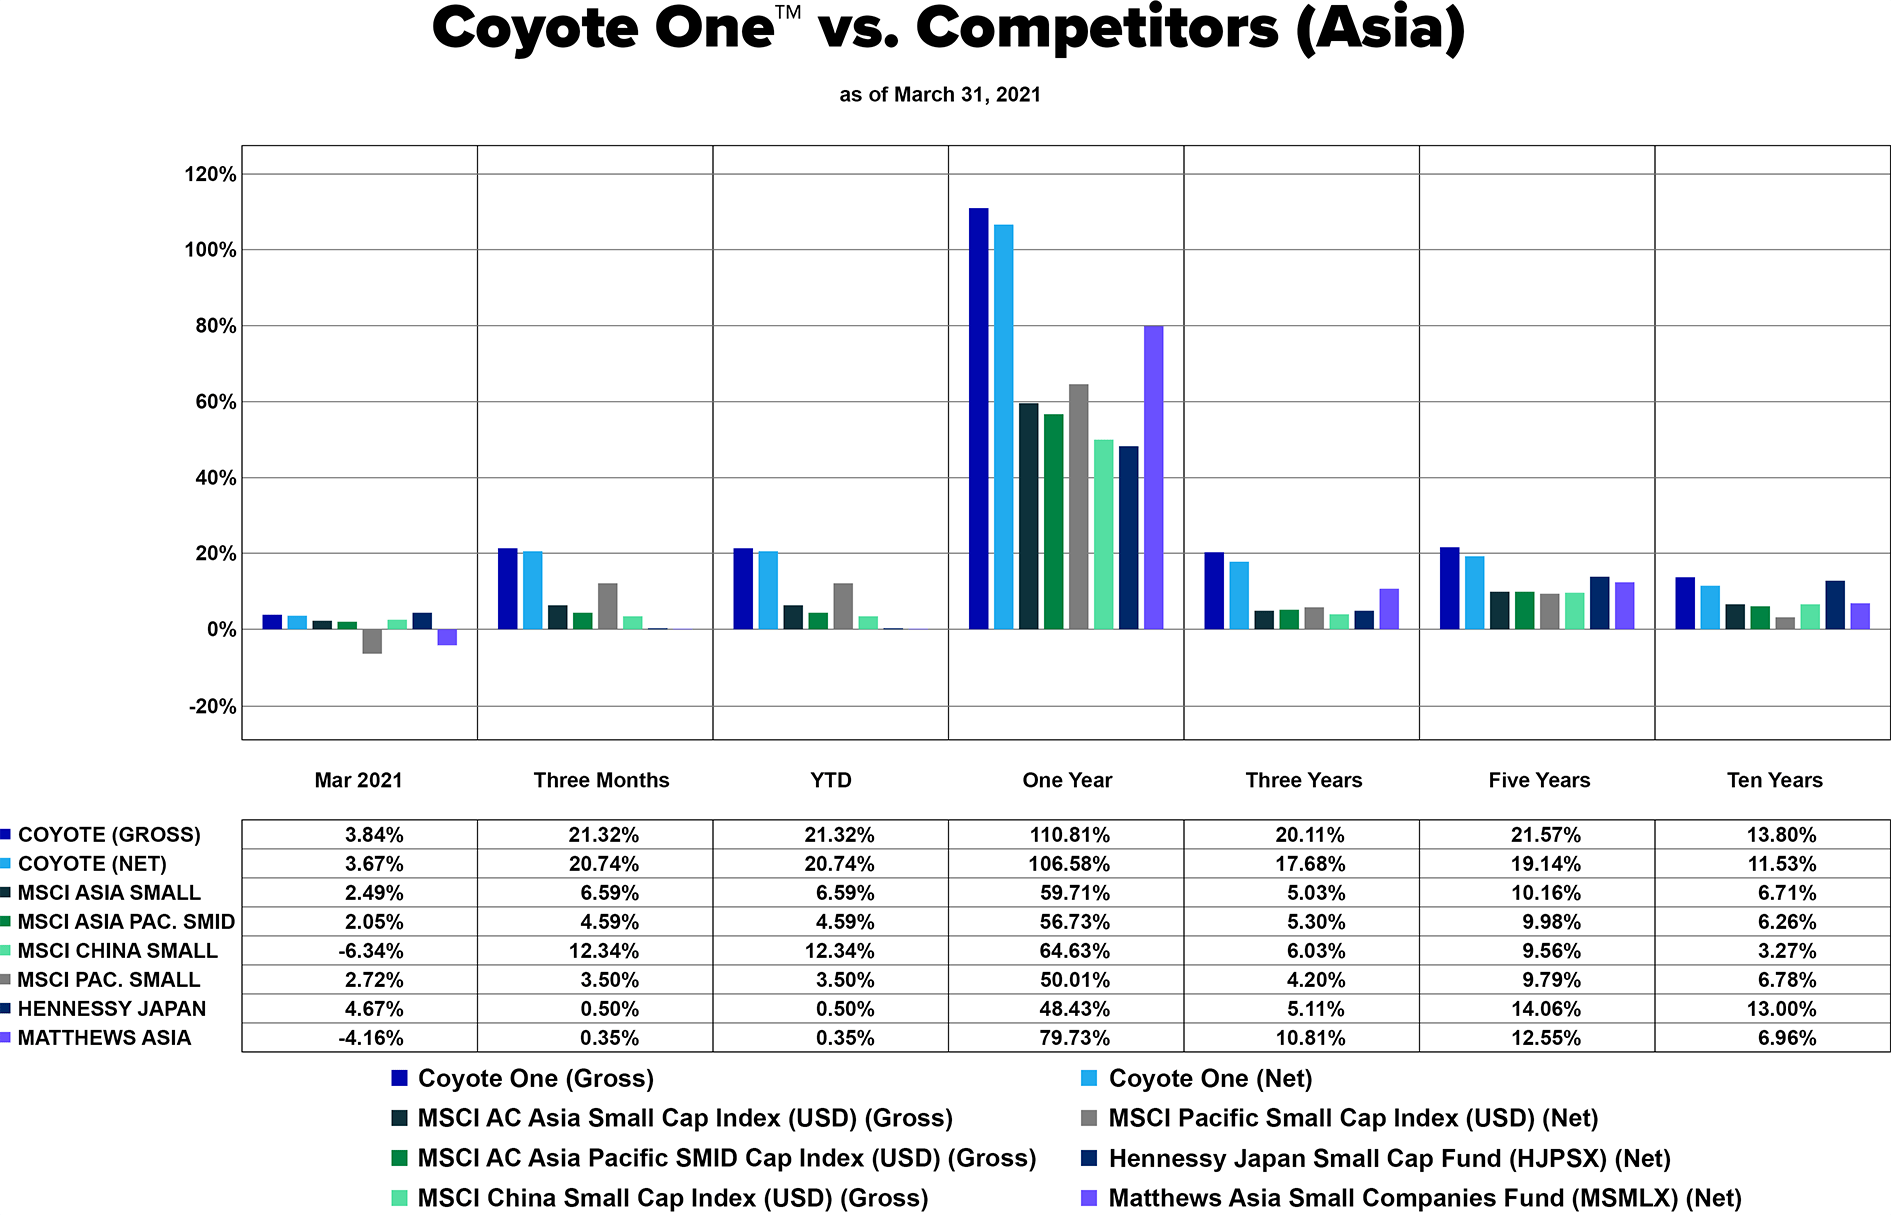 Coyote One vs. Competitors (Asia) - 2021.03 - English - white bkgd